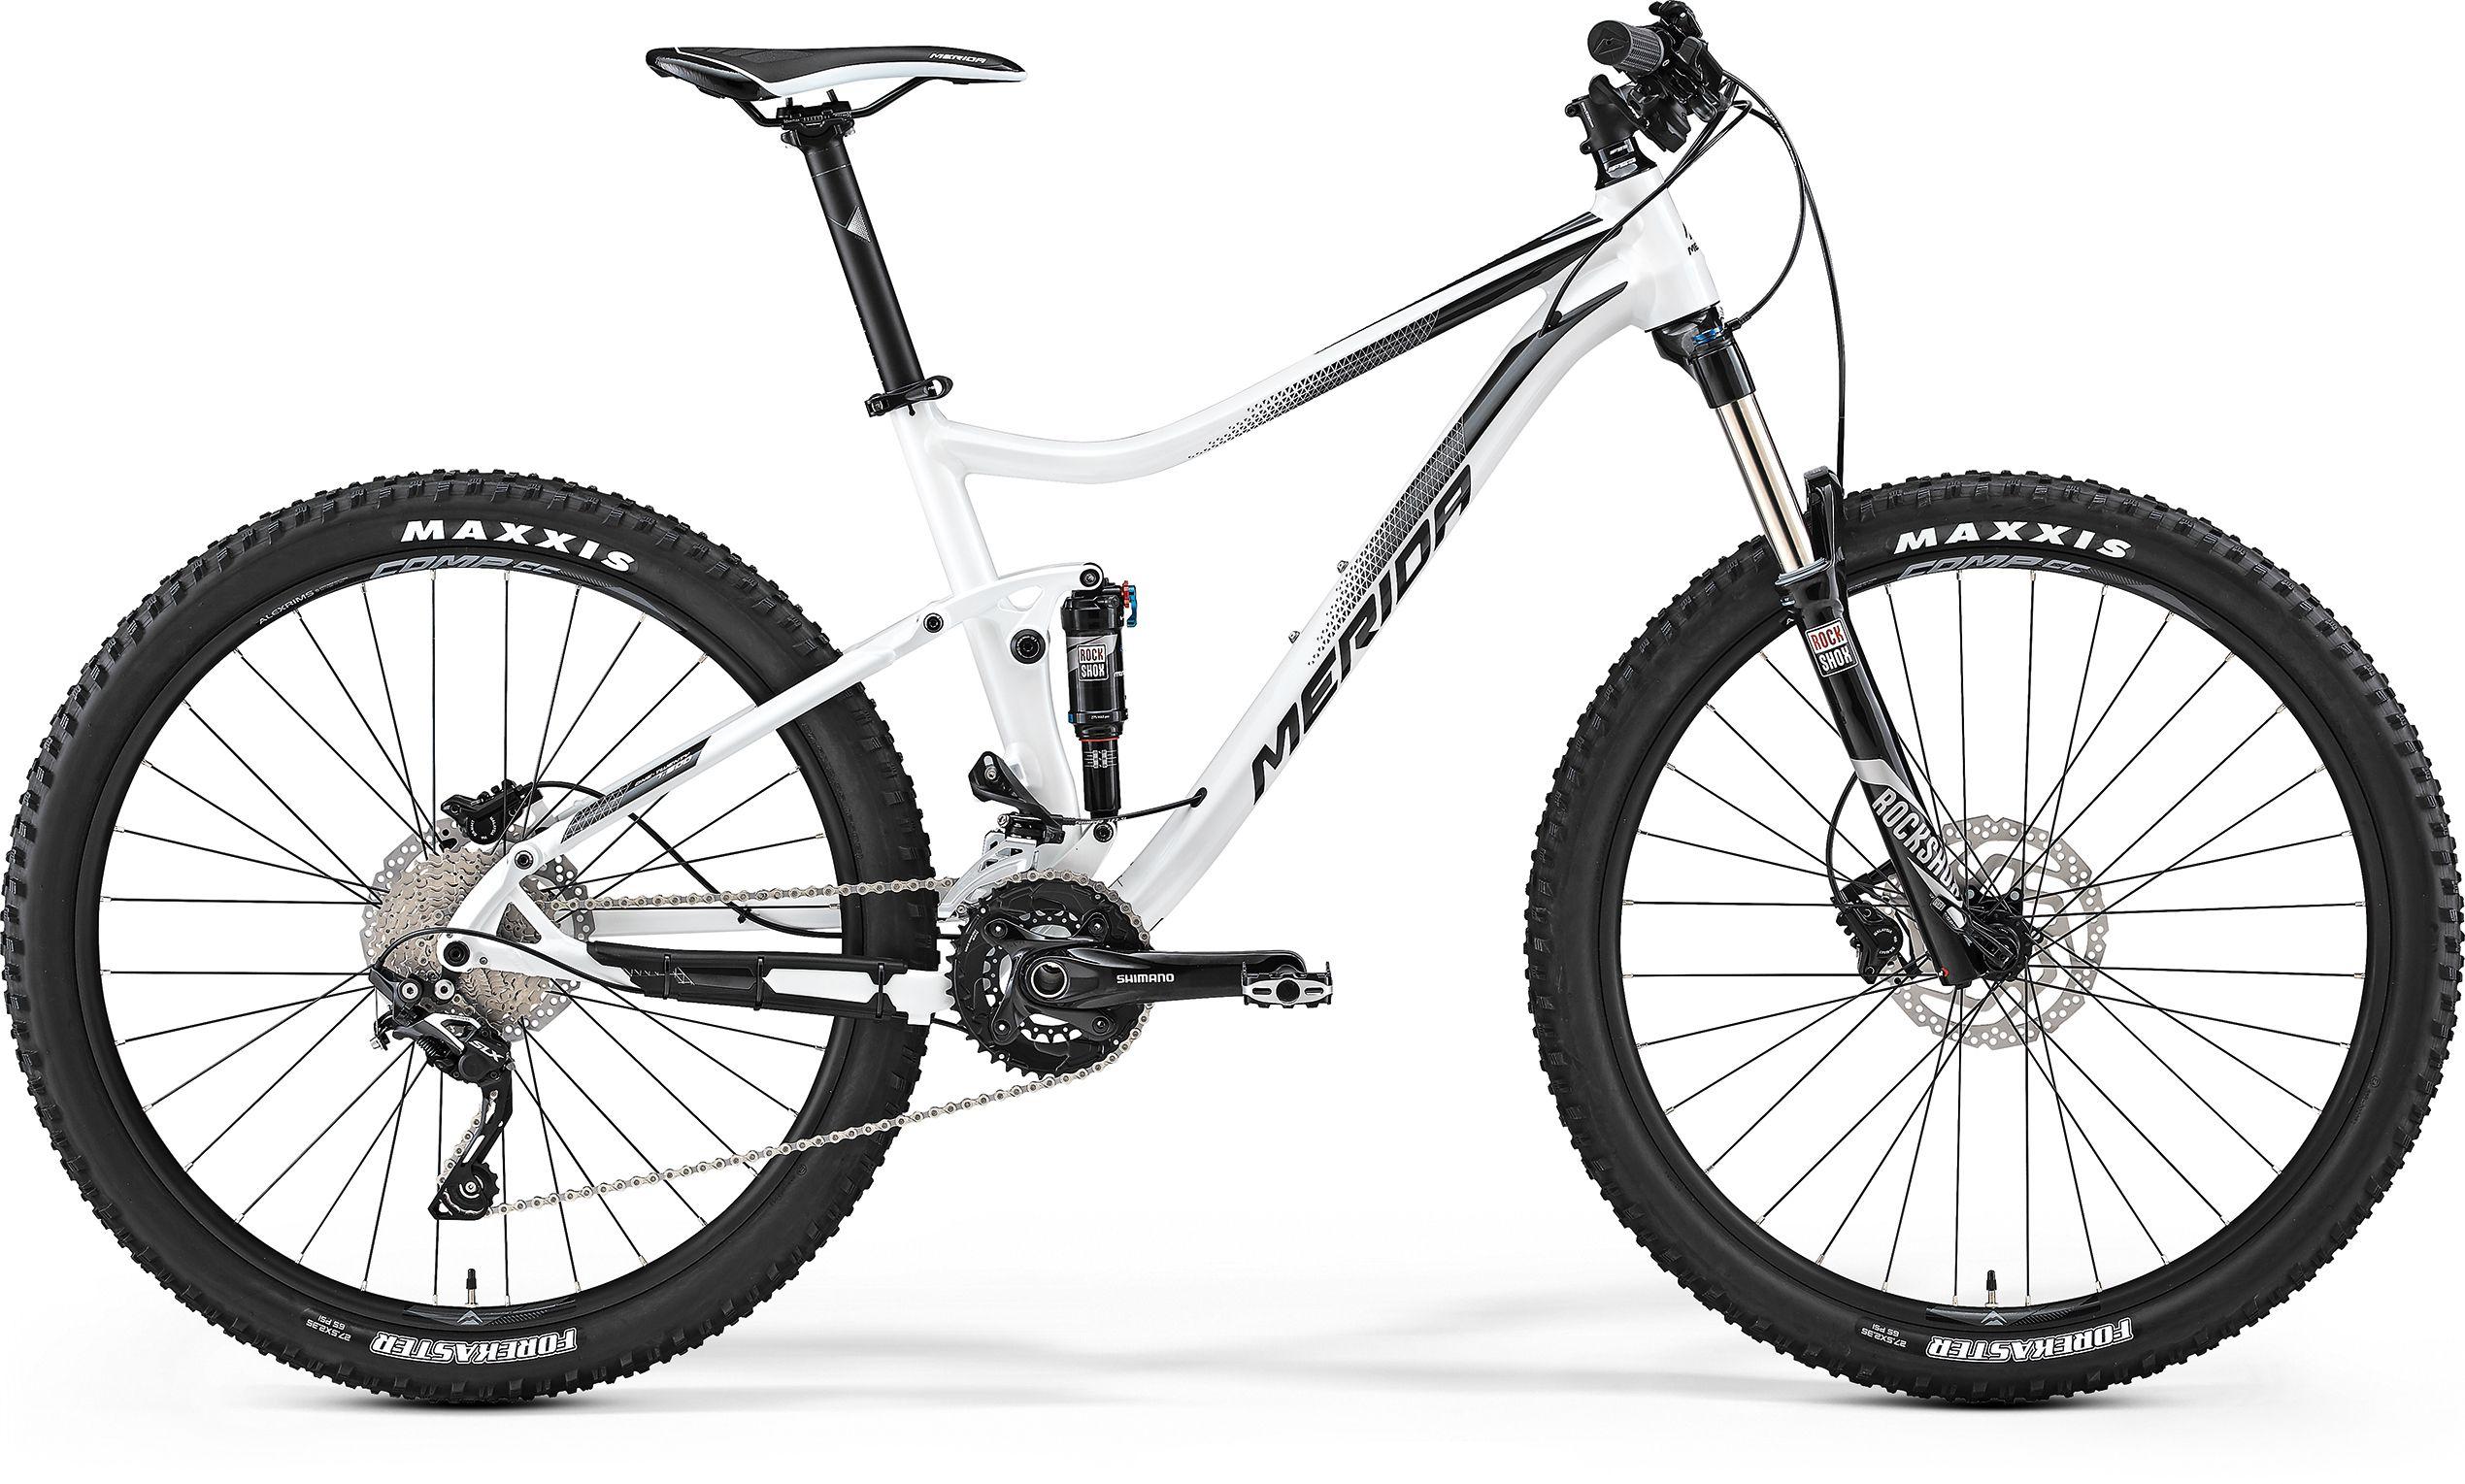 Велосипед Merida One-Twenty 7.600 2017,  Двухподвесы  - артикул:274467